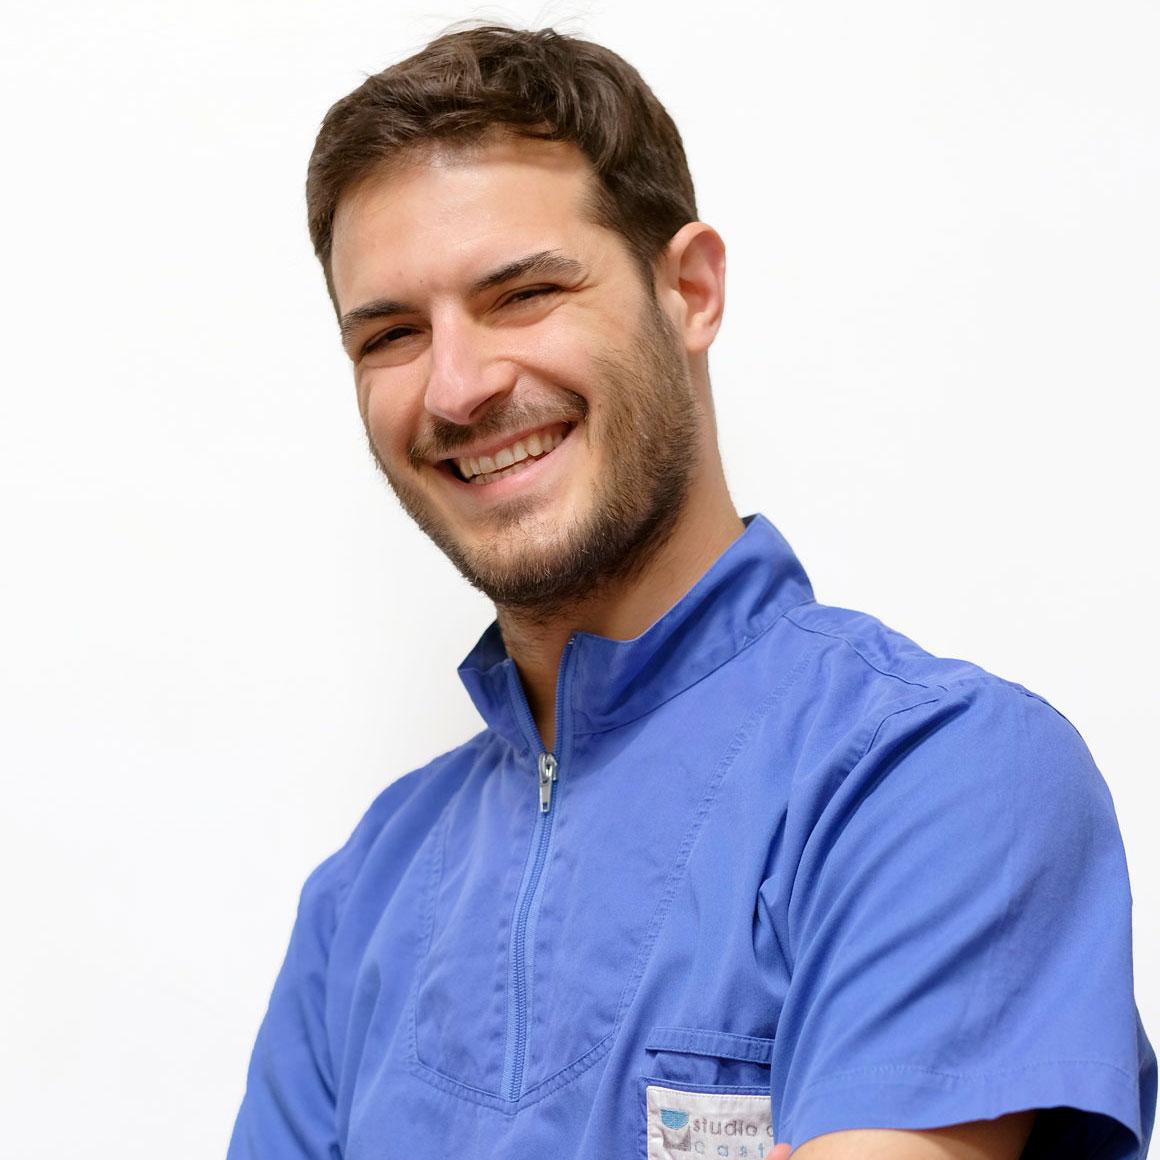 Dott. Enrico Ghidoni